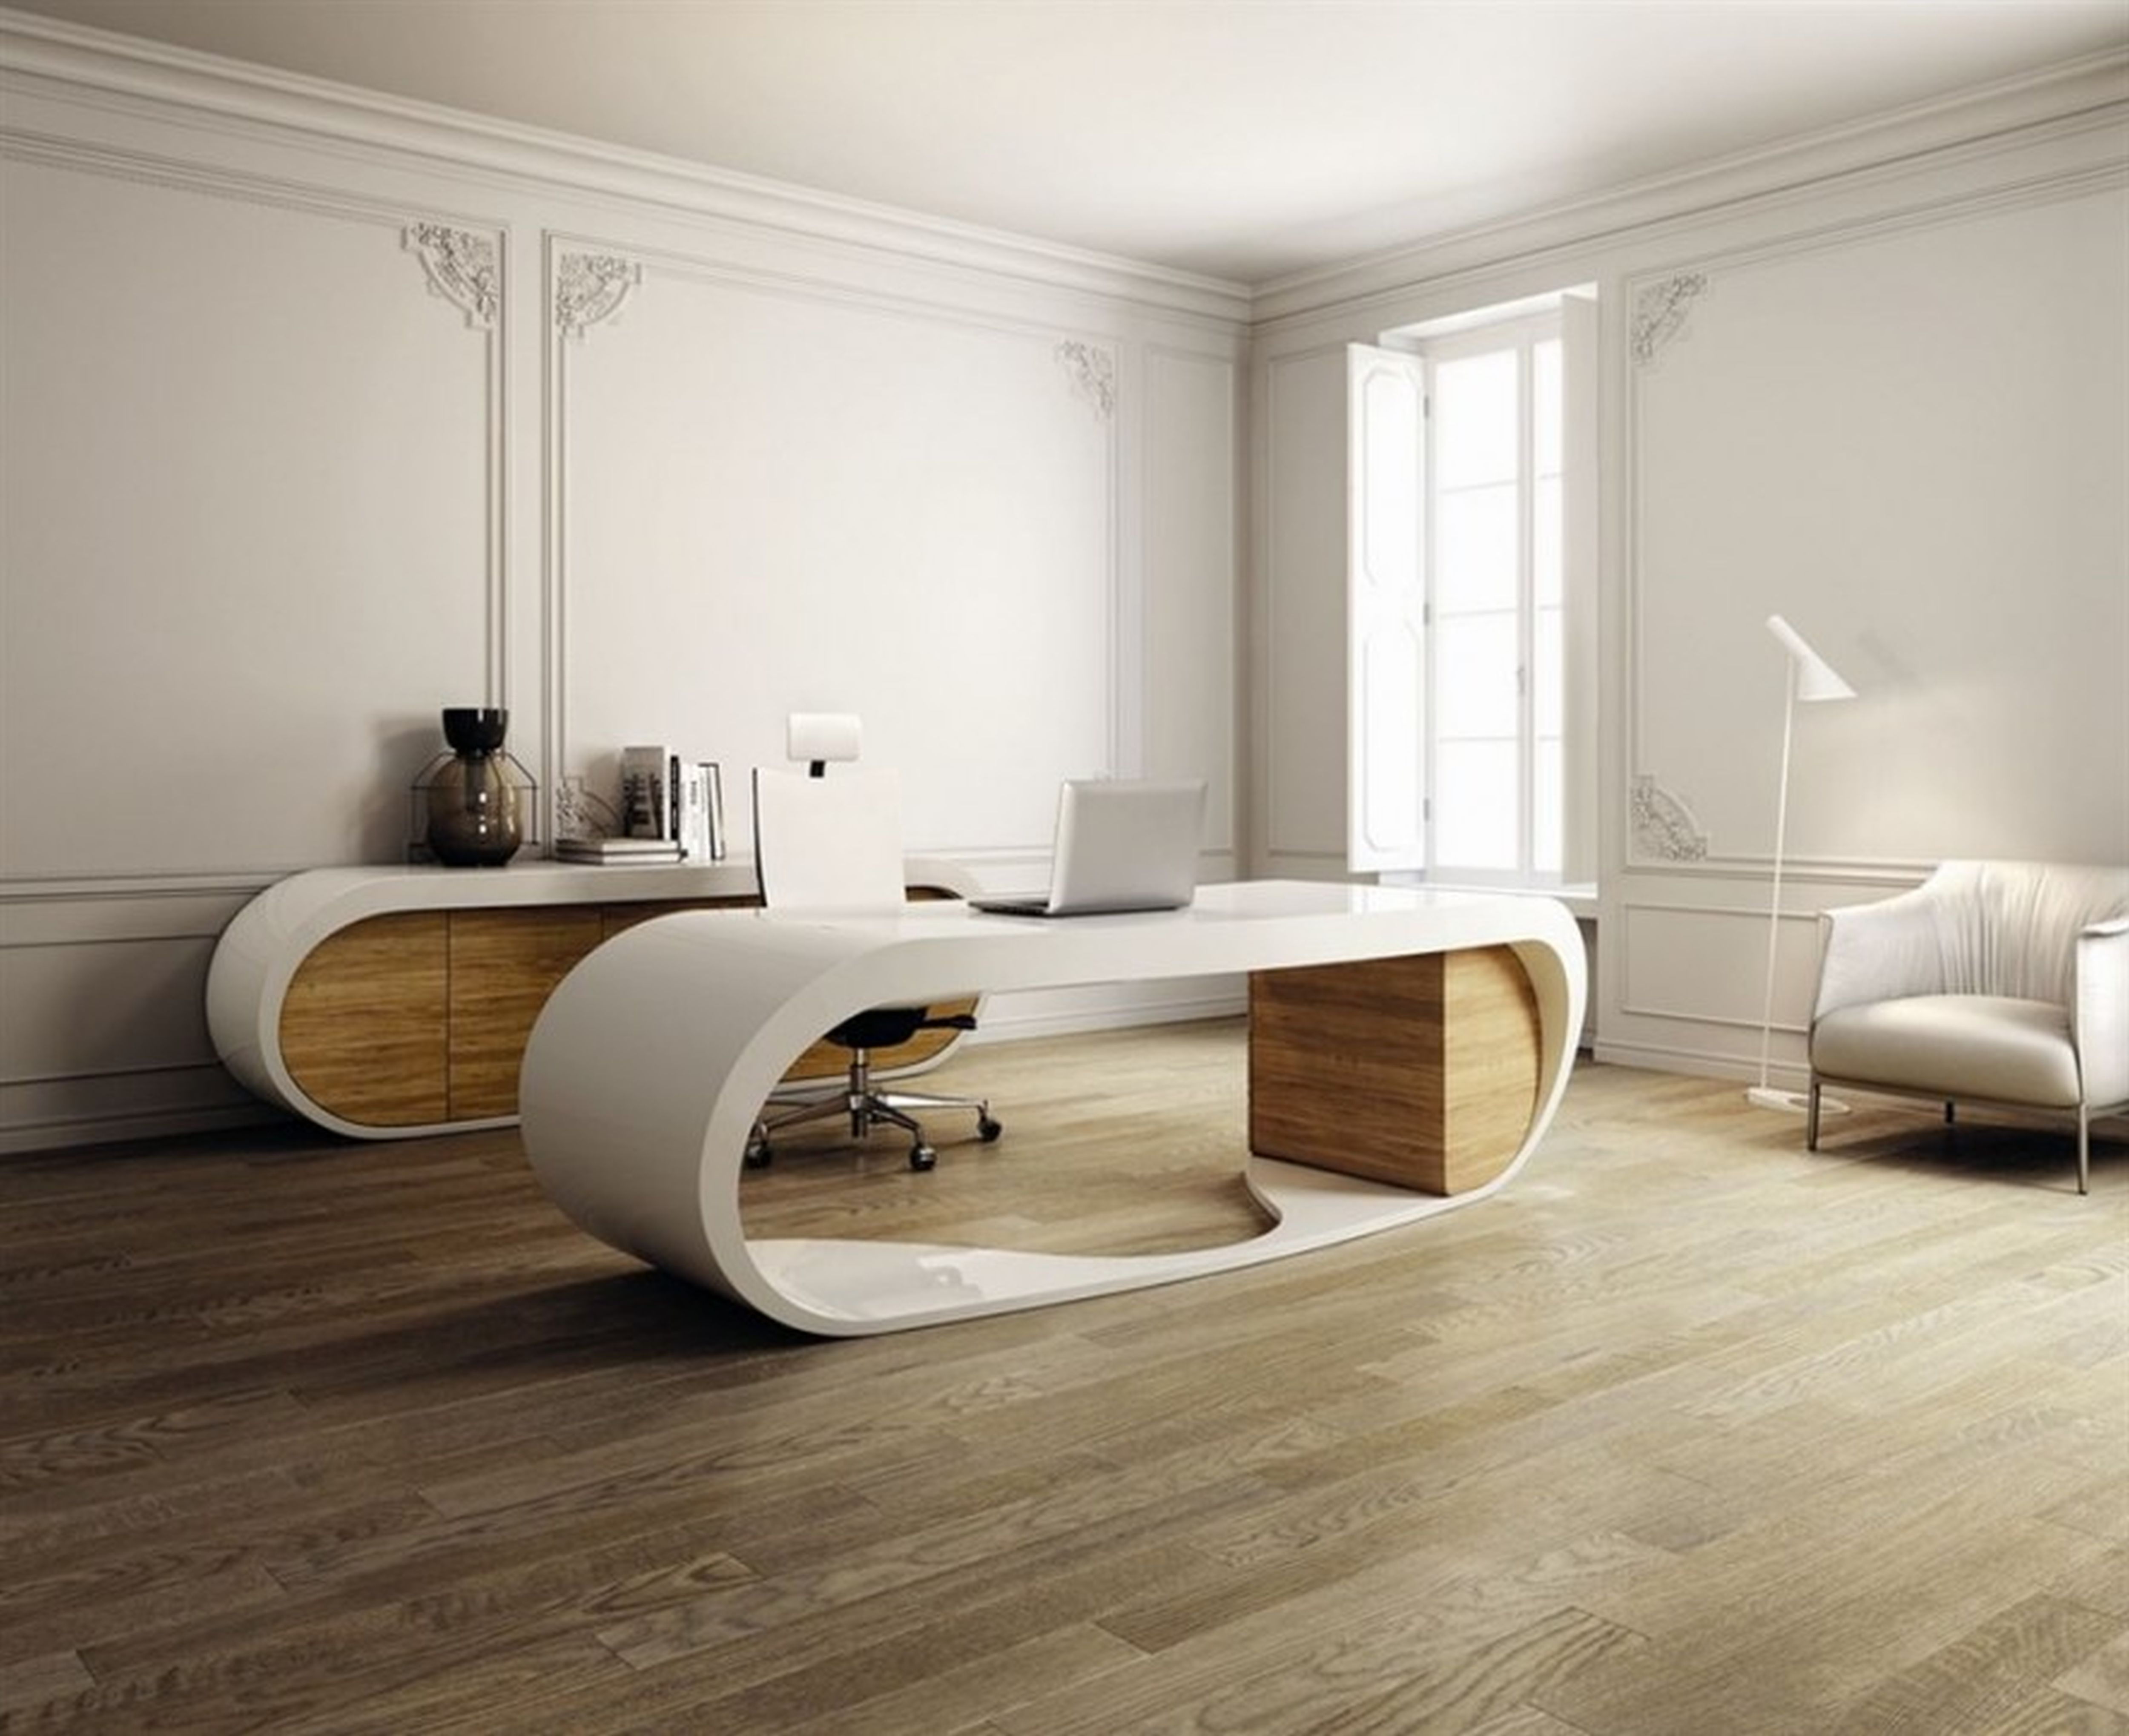 Office Furniture Http Www Belllus Com Office Design Inspiration Home Office Design Office Desk Designs